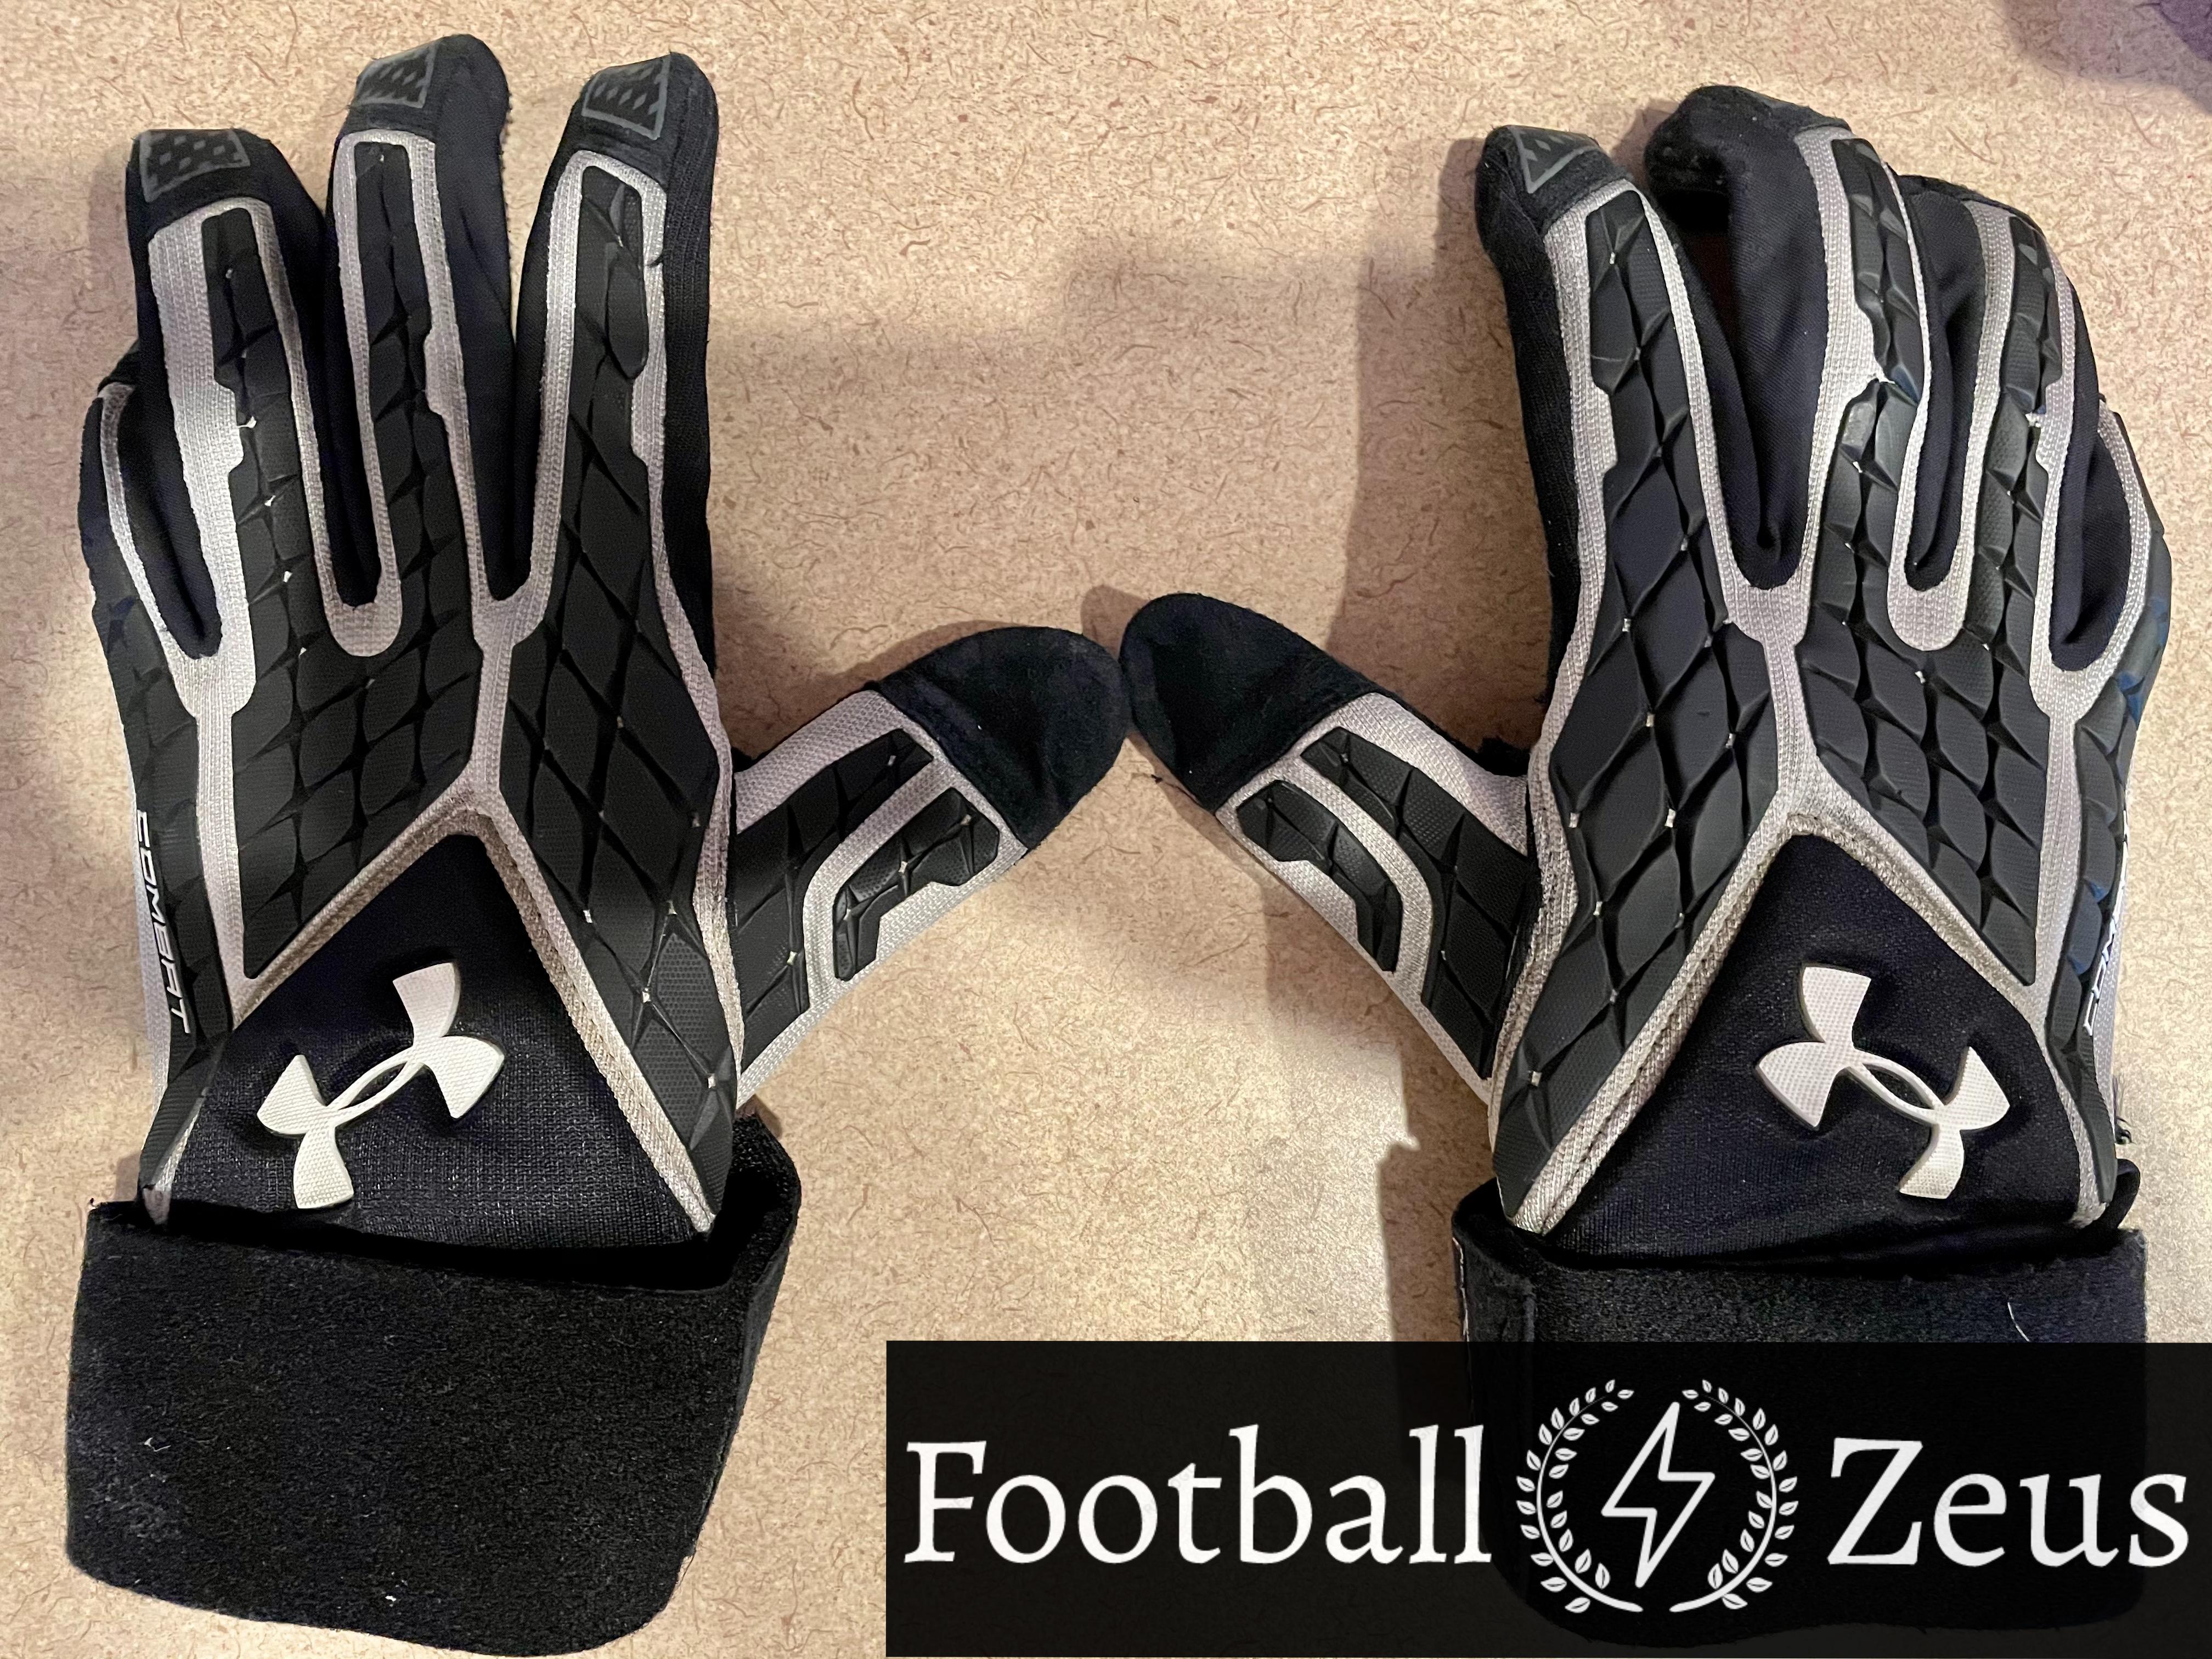 Under Armour Combat V Football Gloves